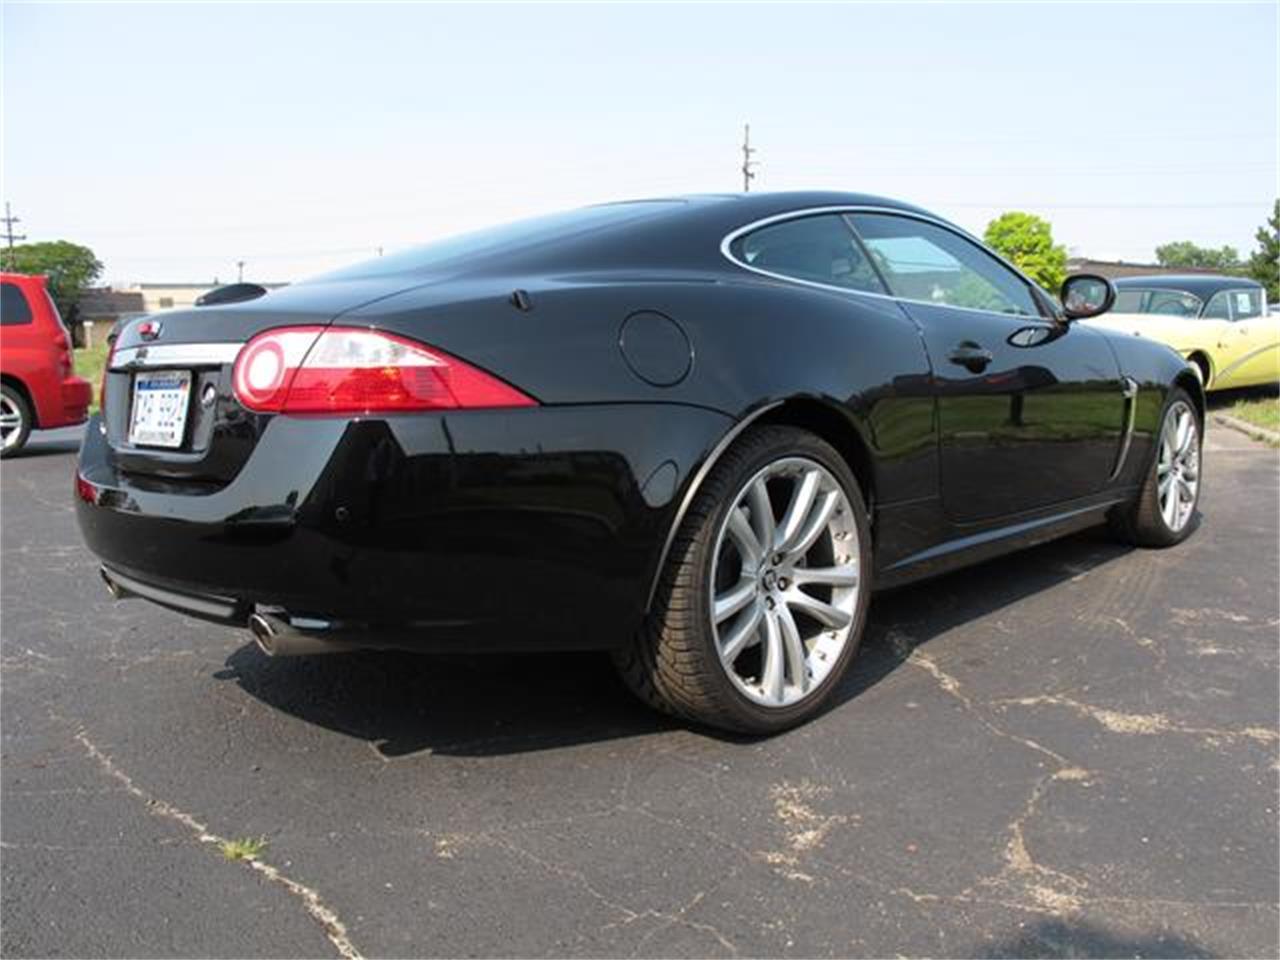 Large Picture of 2007 Jaguar XK located in Michigan - $31,750.00 - C6YE